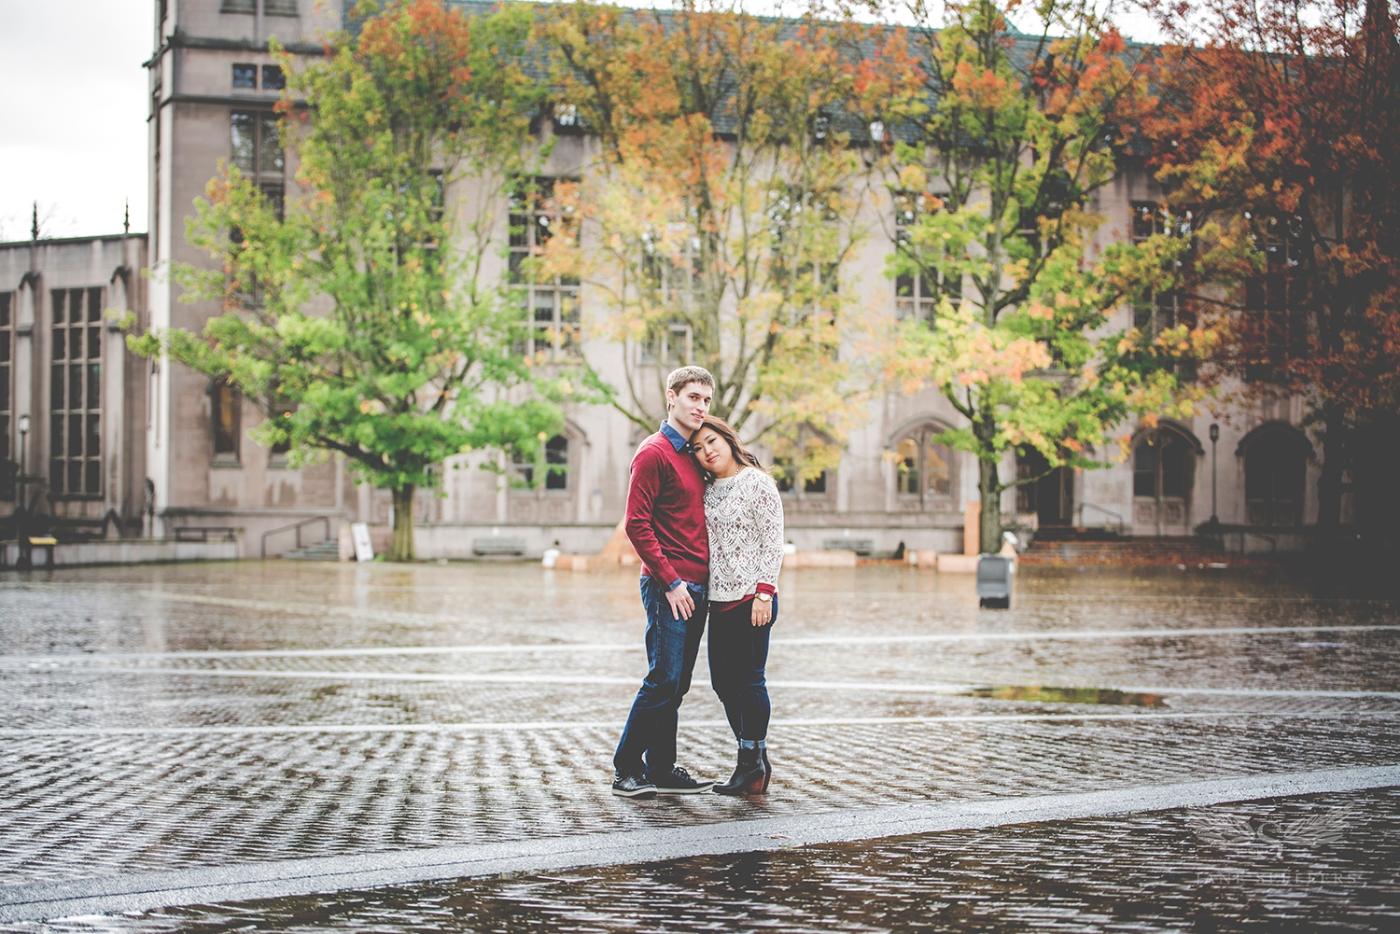 Engagement-UW-Lawcampus_Rebecca_and_Evan Engagement-UW-Lawcampus_Rebecca_and_Evan_ 2DSC_4168